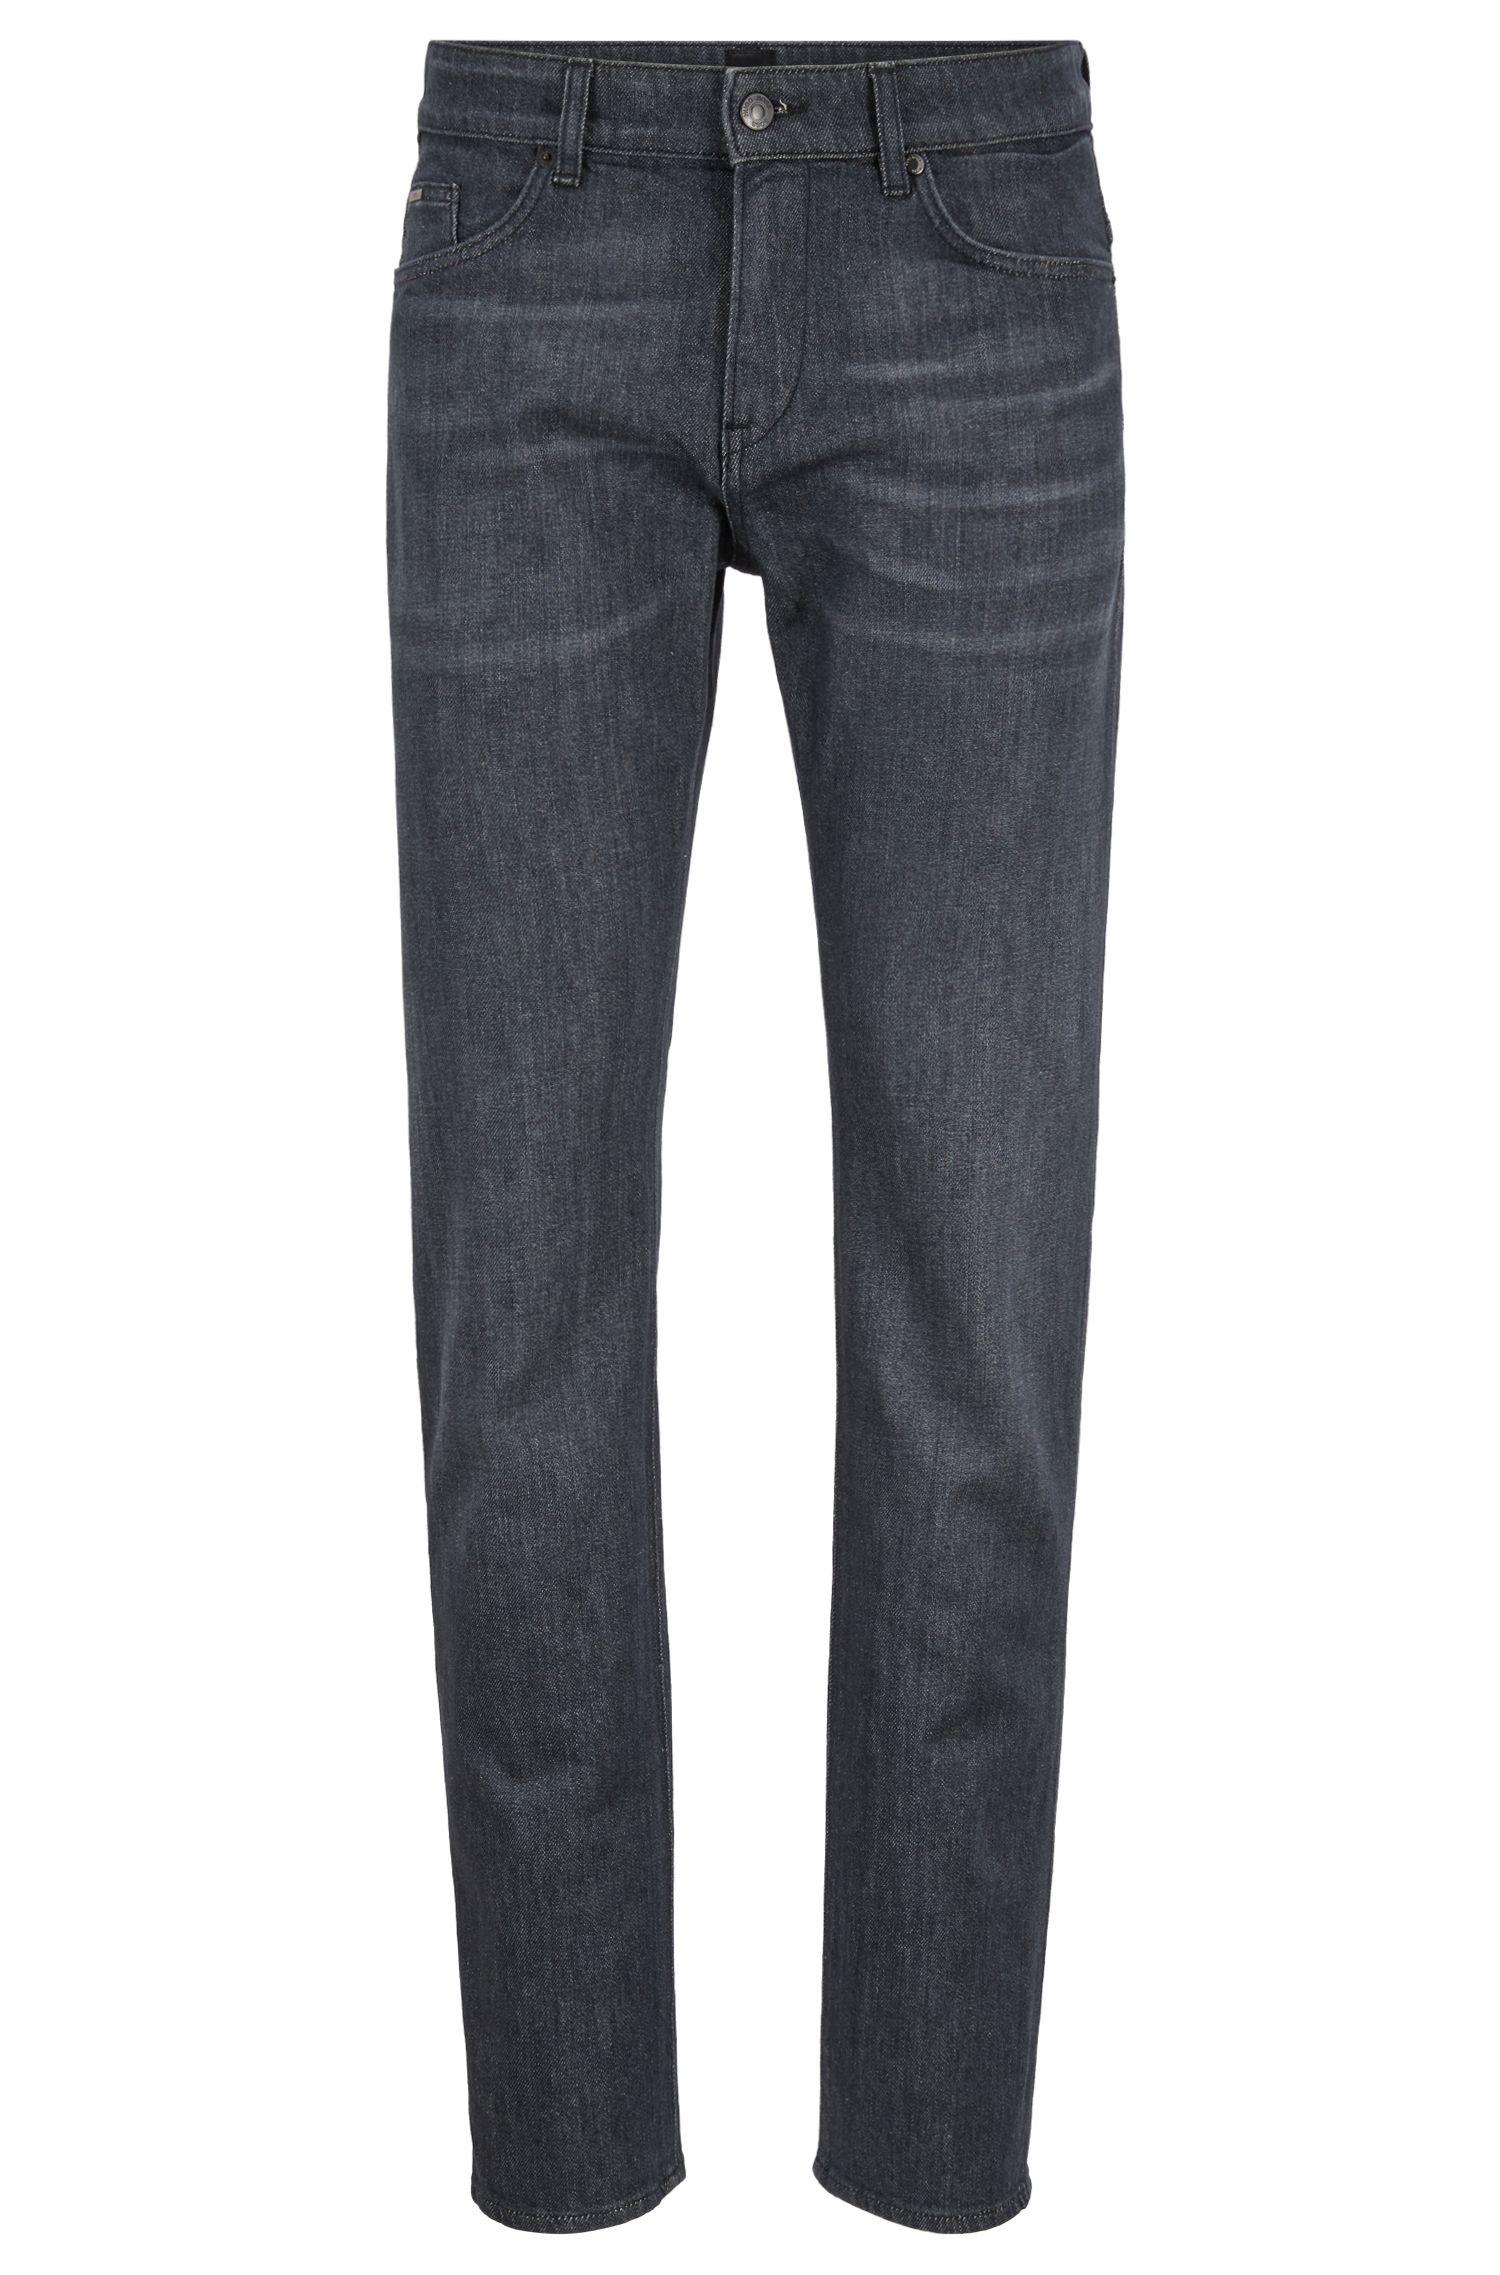 Slim-fit jeans in Italian comfort-stretch black denim, Charcoal